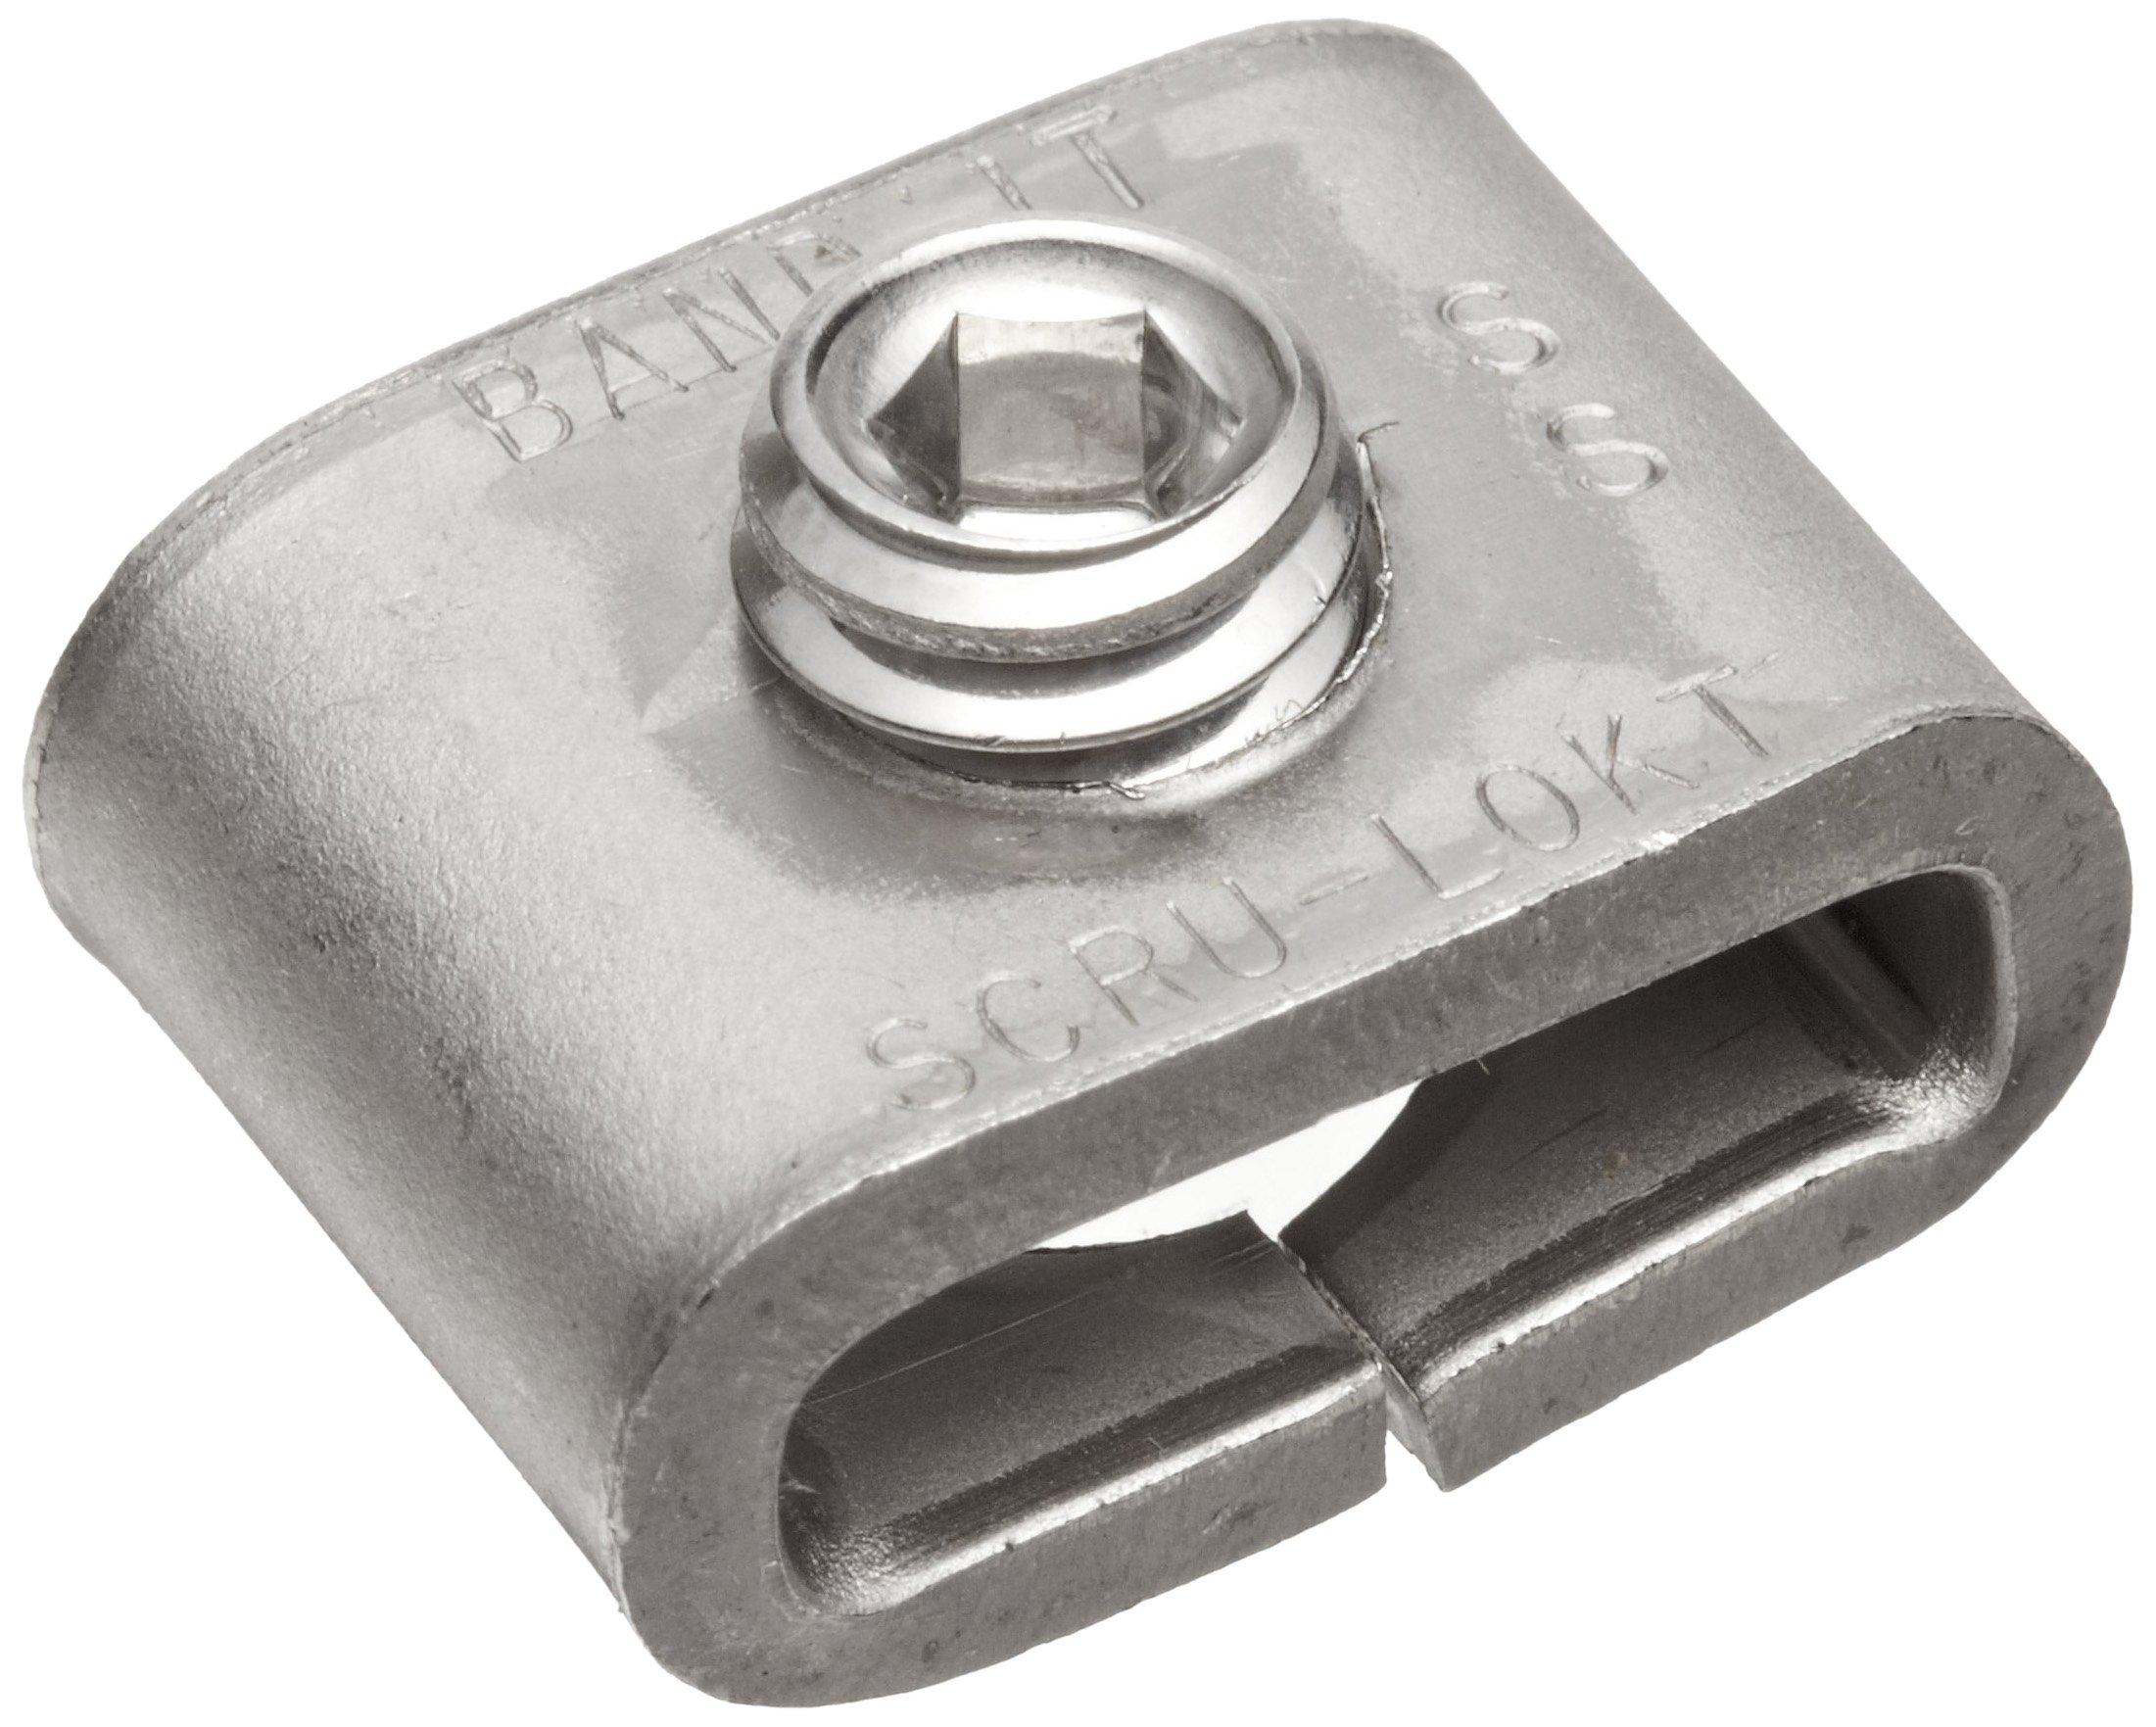 BAND-IT C72499 301 Stainless Steel 1/4 Hard Steel Scru-Lokt Buckle, 1/2'' Width, 25 per Box by Band-It